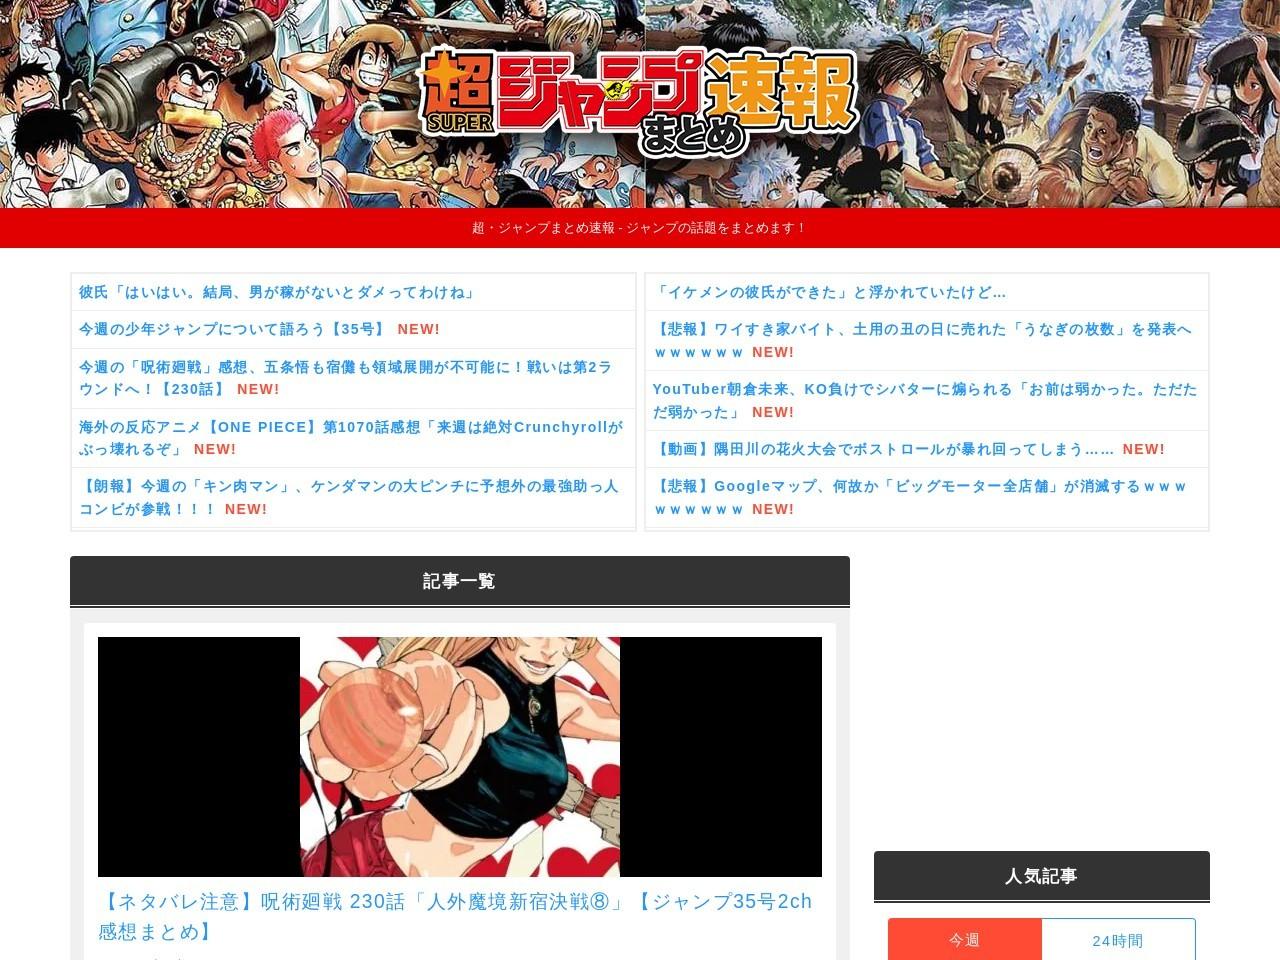 jumpmatome2ch.net. 【ネタバレ注意】ワンピース 877